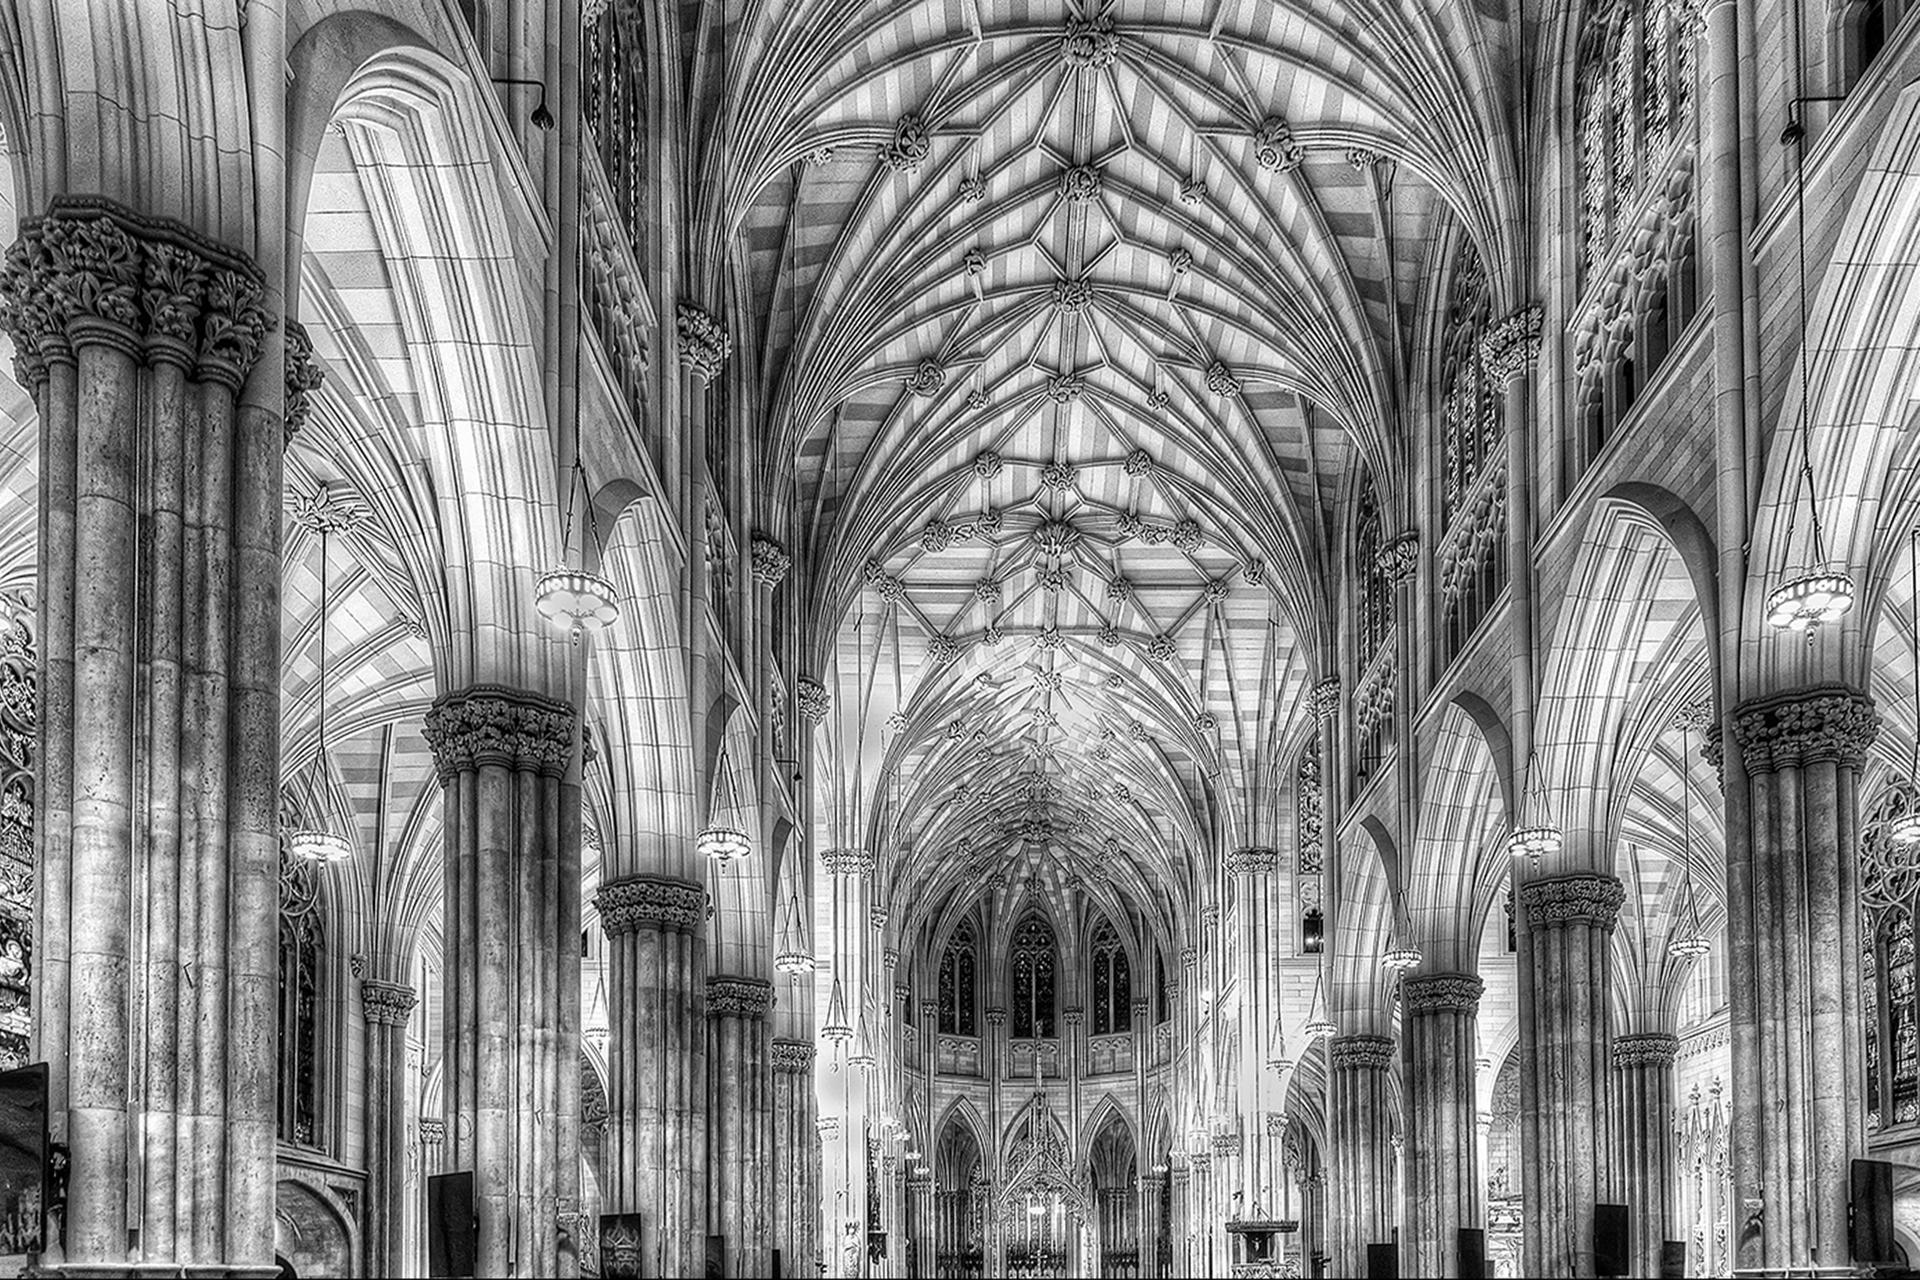 St Patricks Cathedral New York